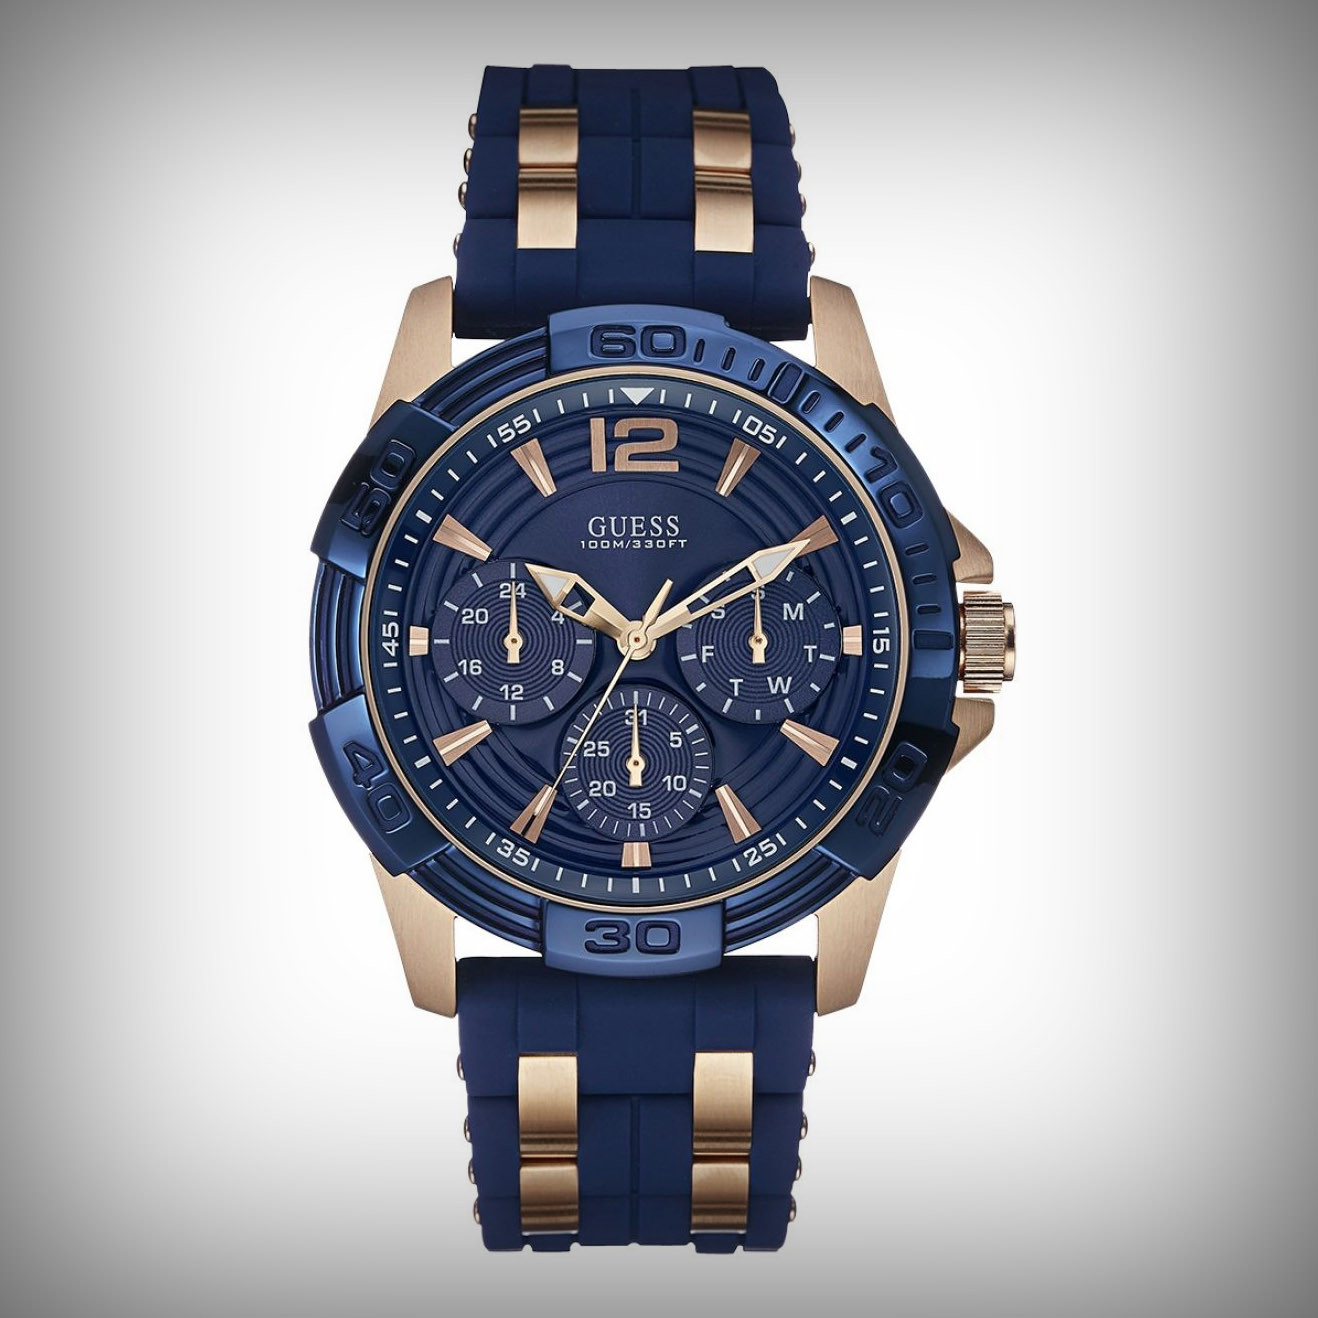 luxe betaalbare horloges, Guess